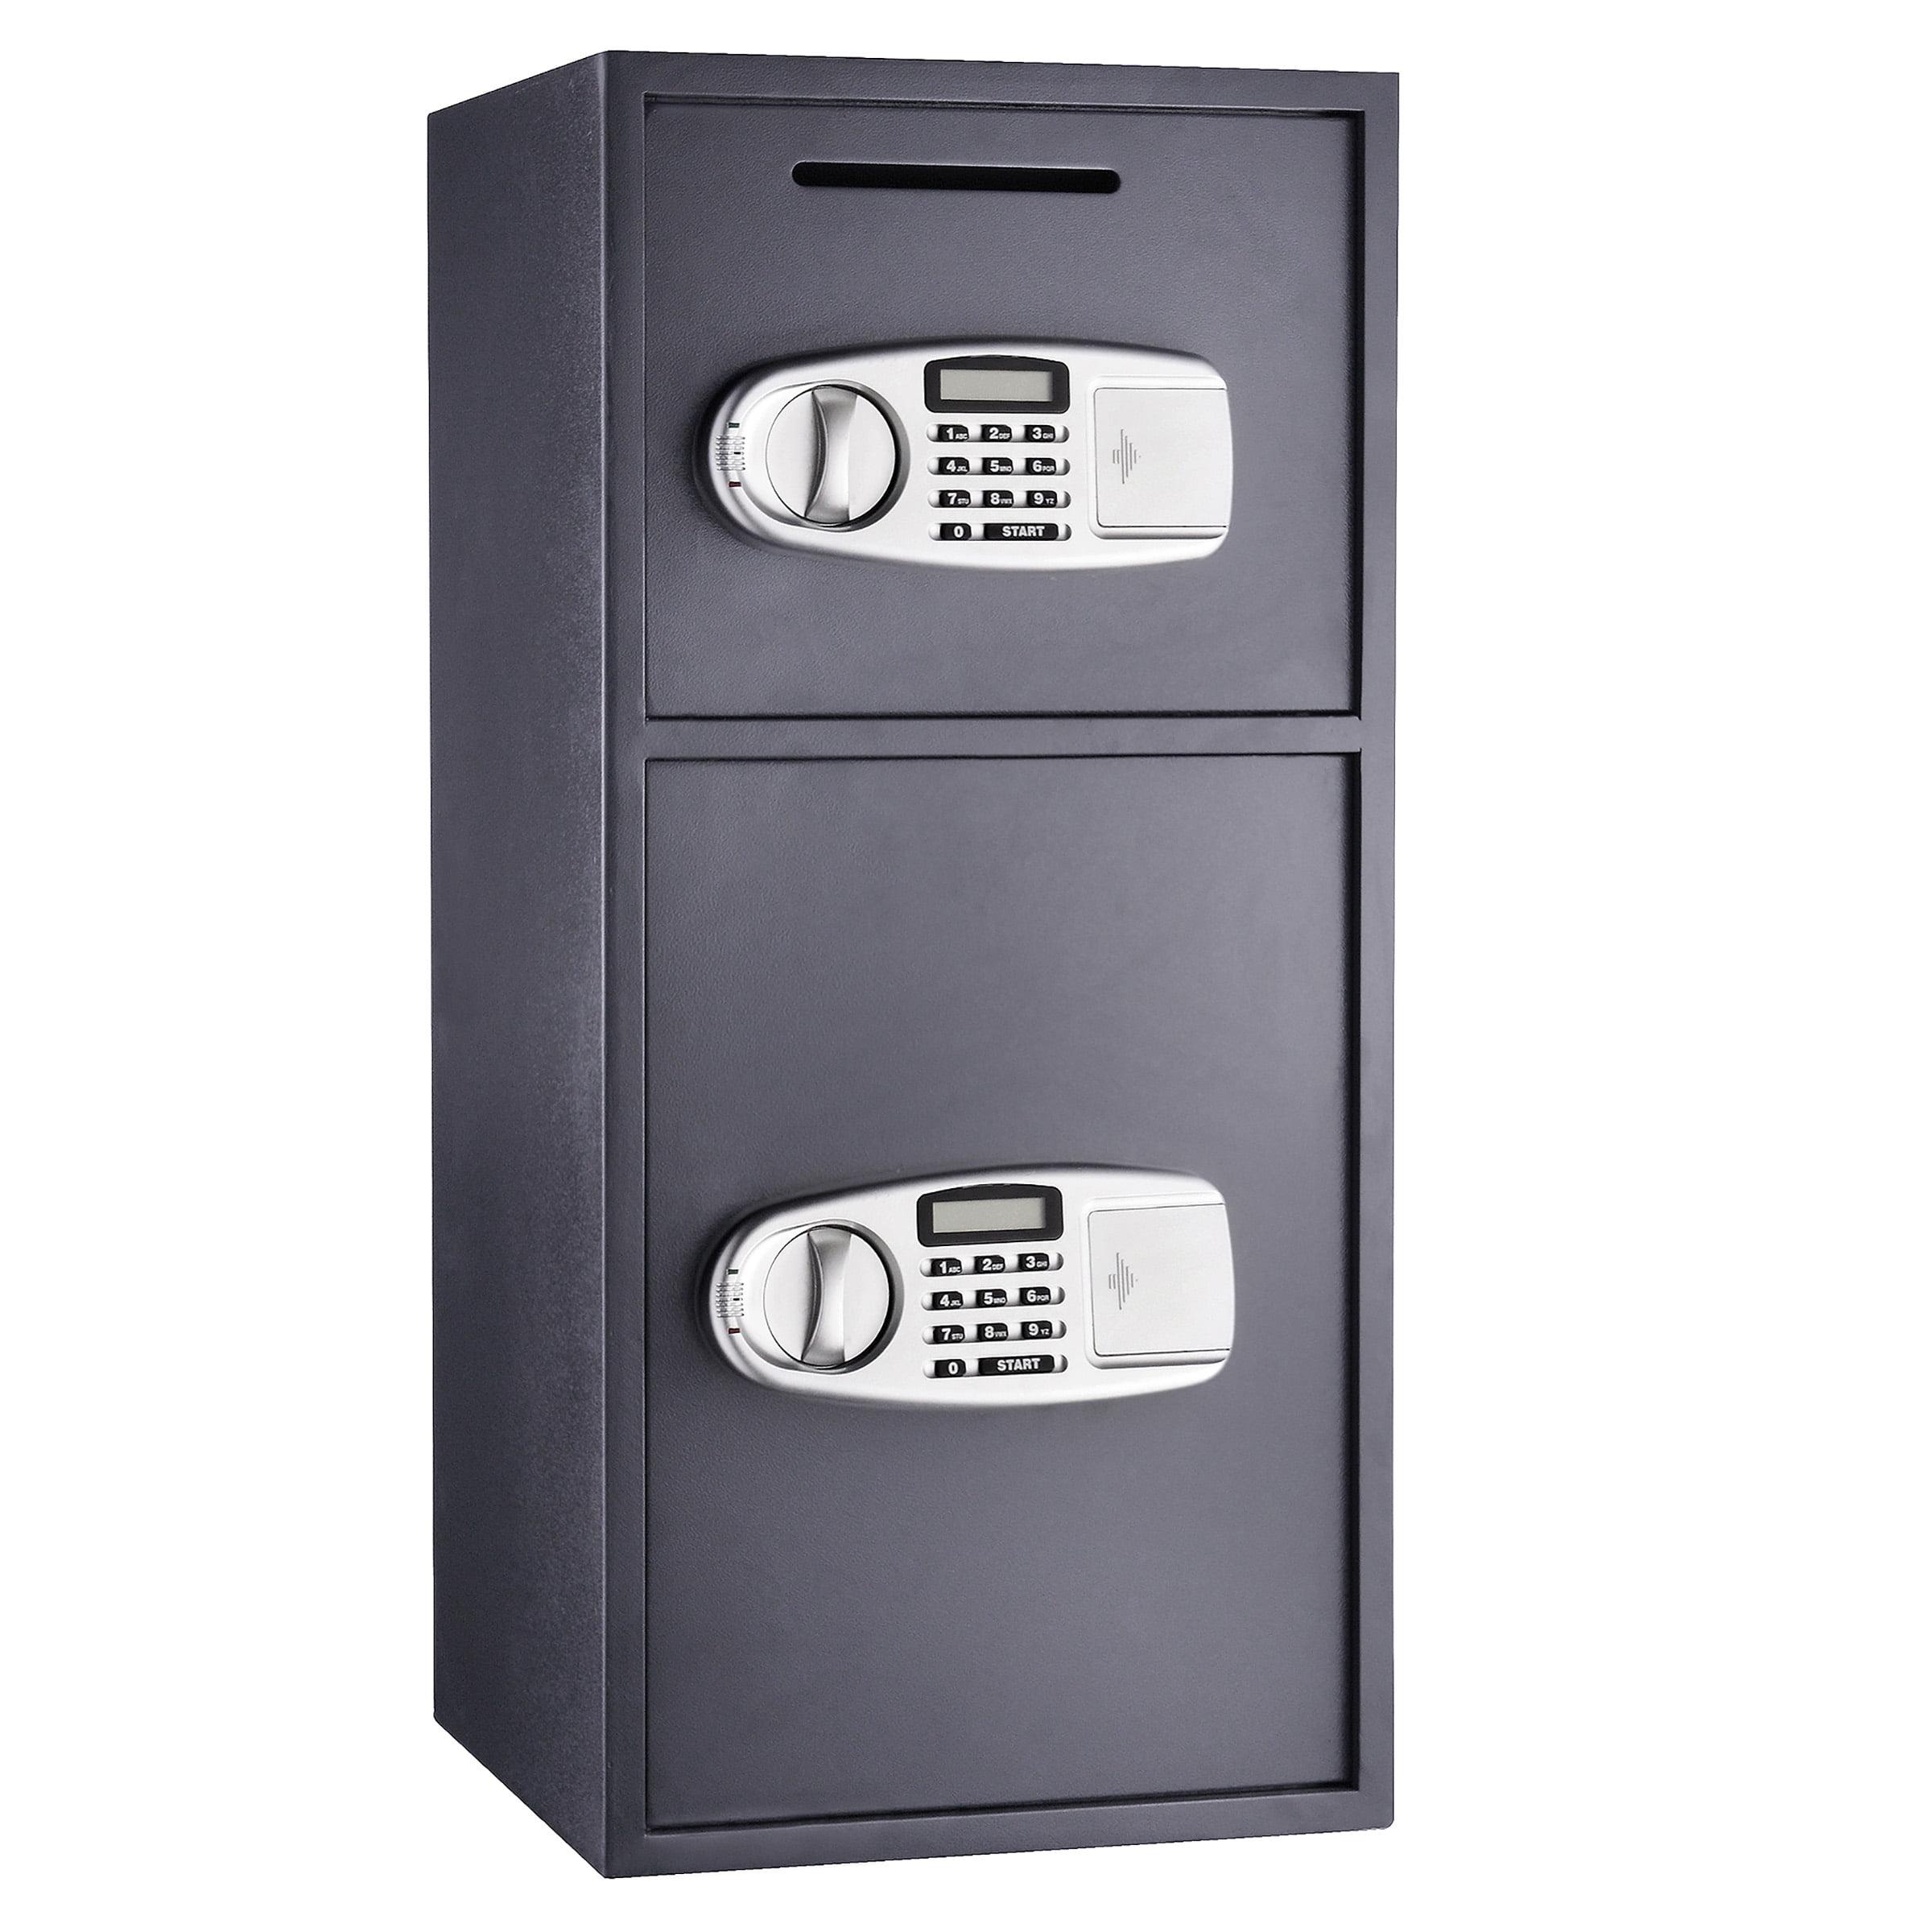 Paragon Lock Safe Double Door Digital Depository Safe Cash Drop Safe Security Walmart Com Walmart Com